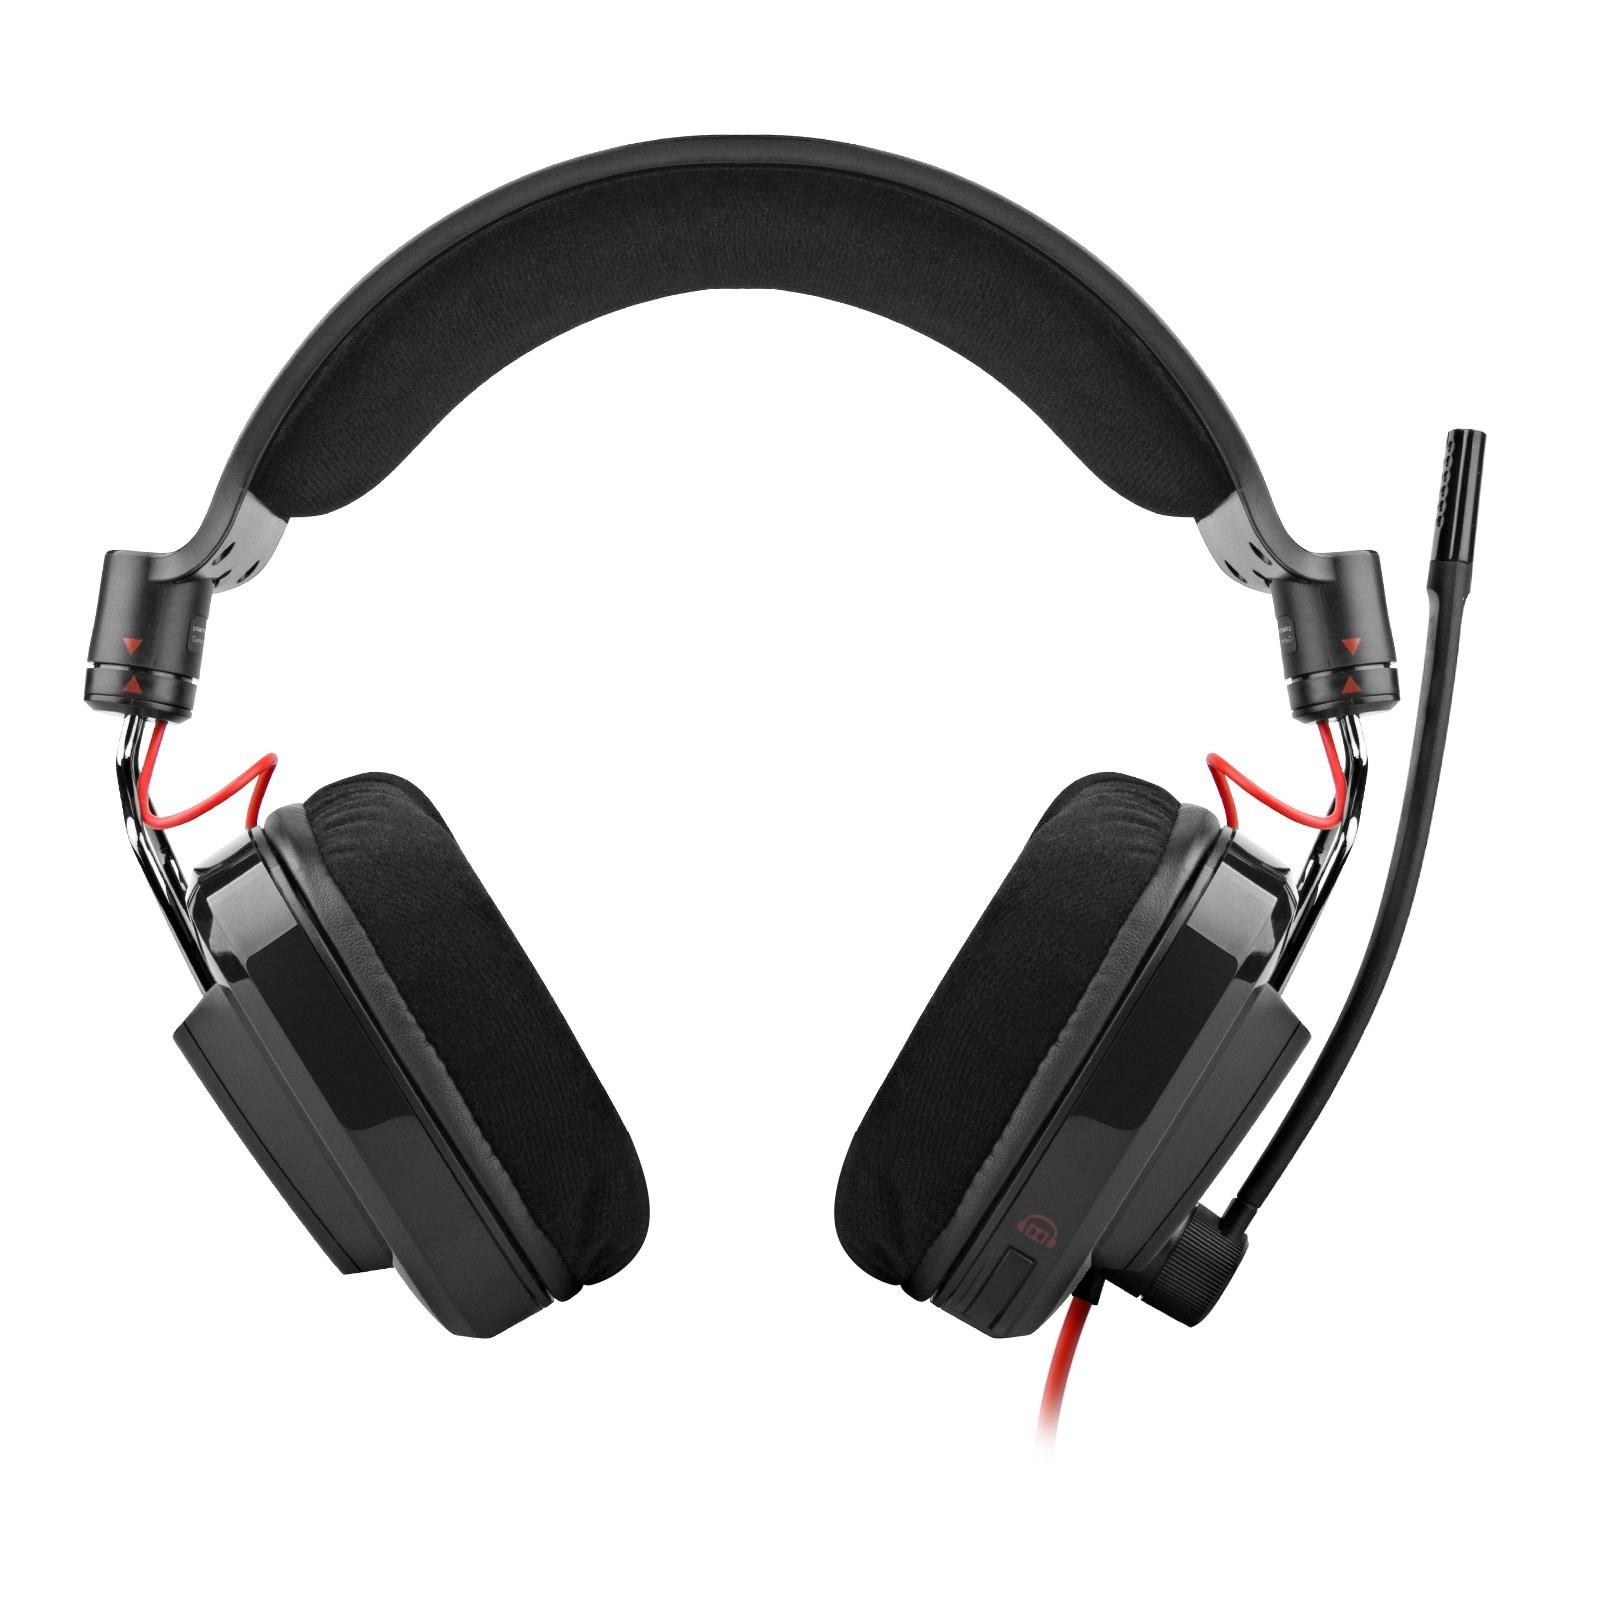 Plantronics GameCom 788 Headset Review - Still the Best ...